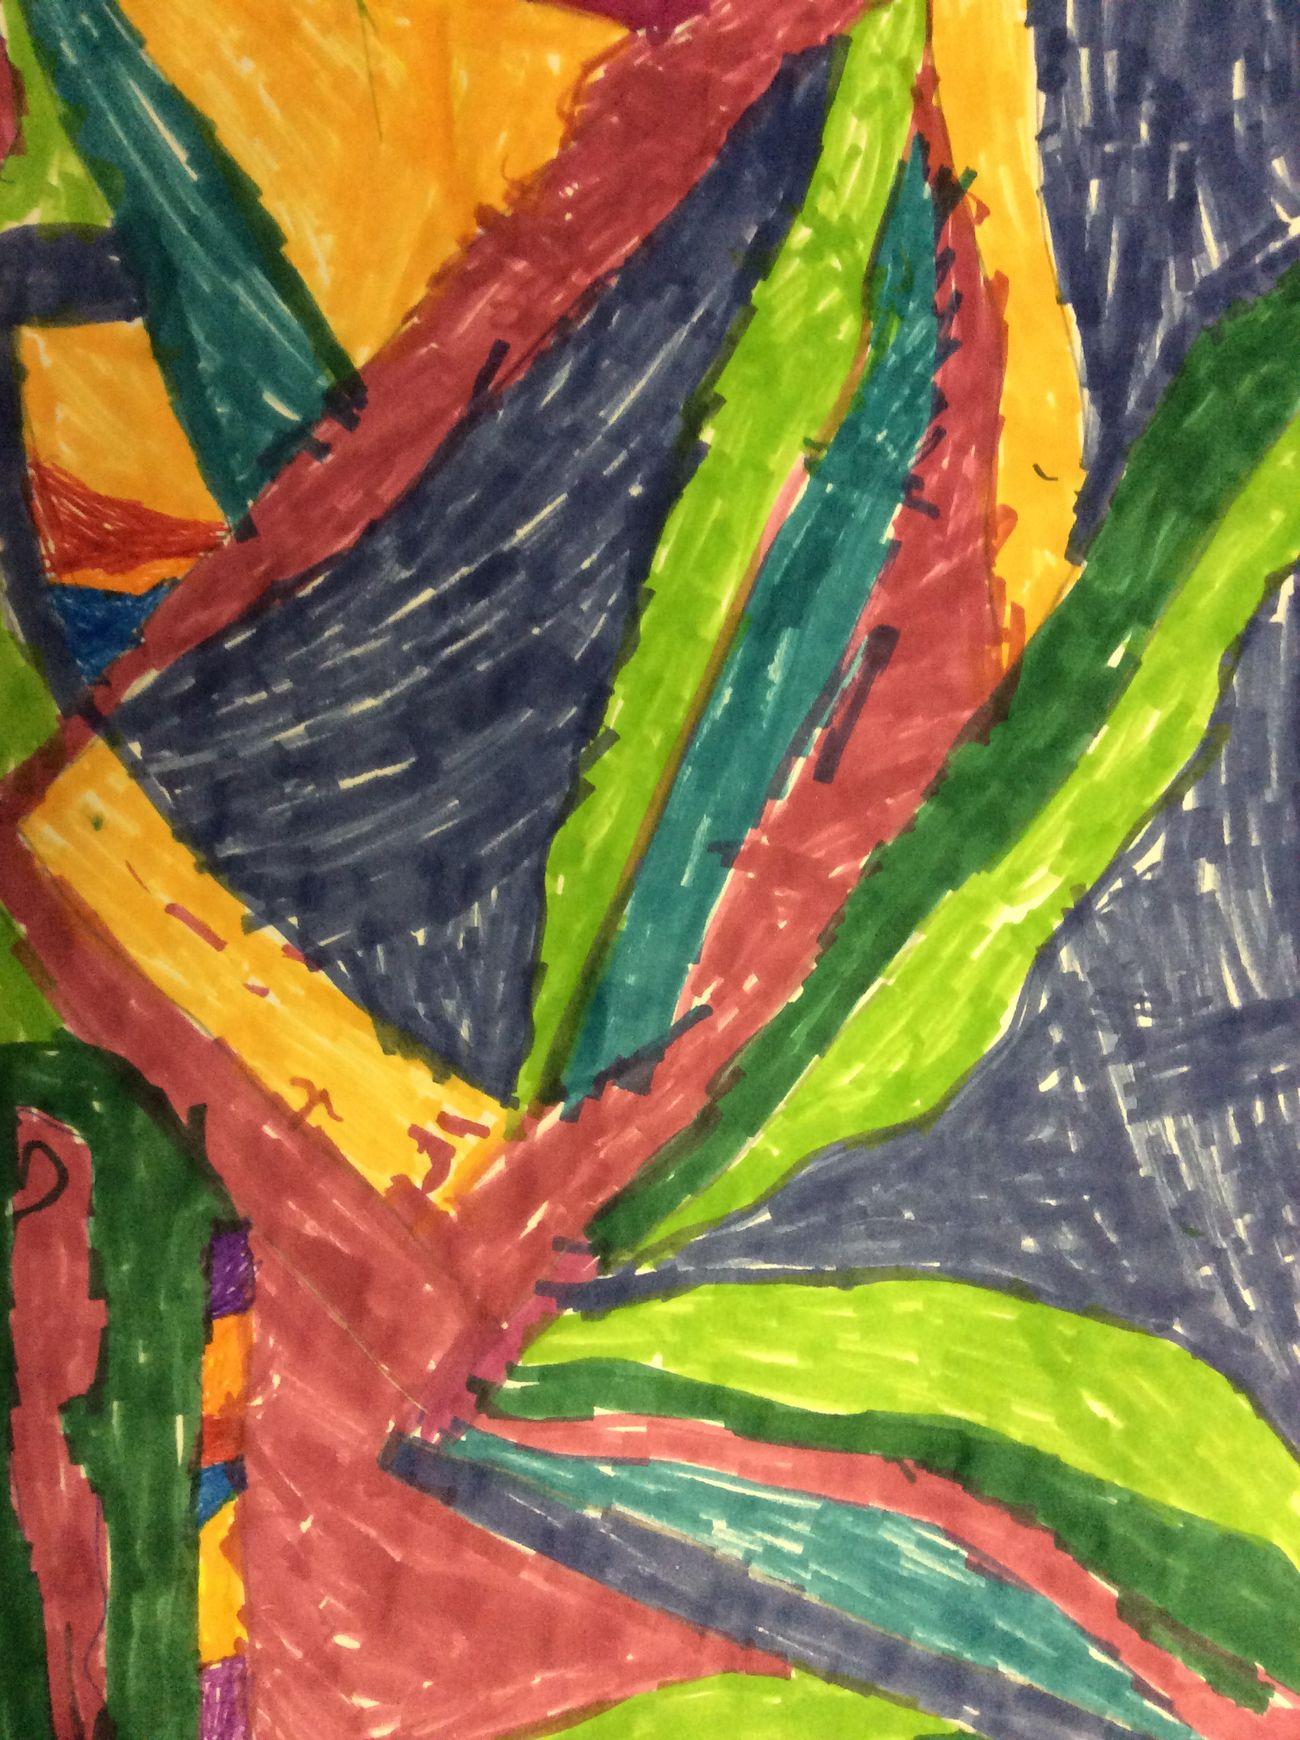 """Mountian art"". By Bract Chamberlain"